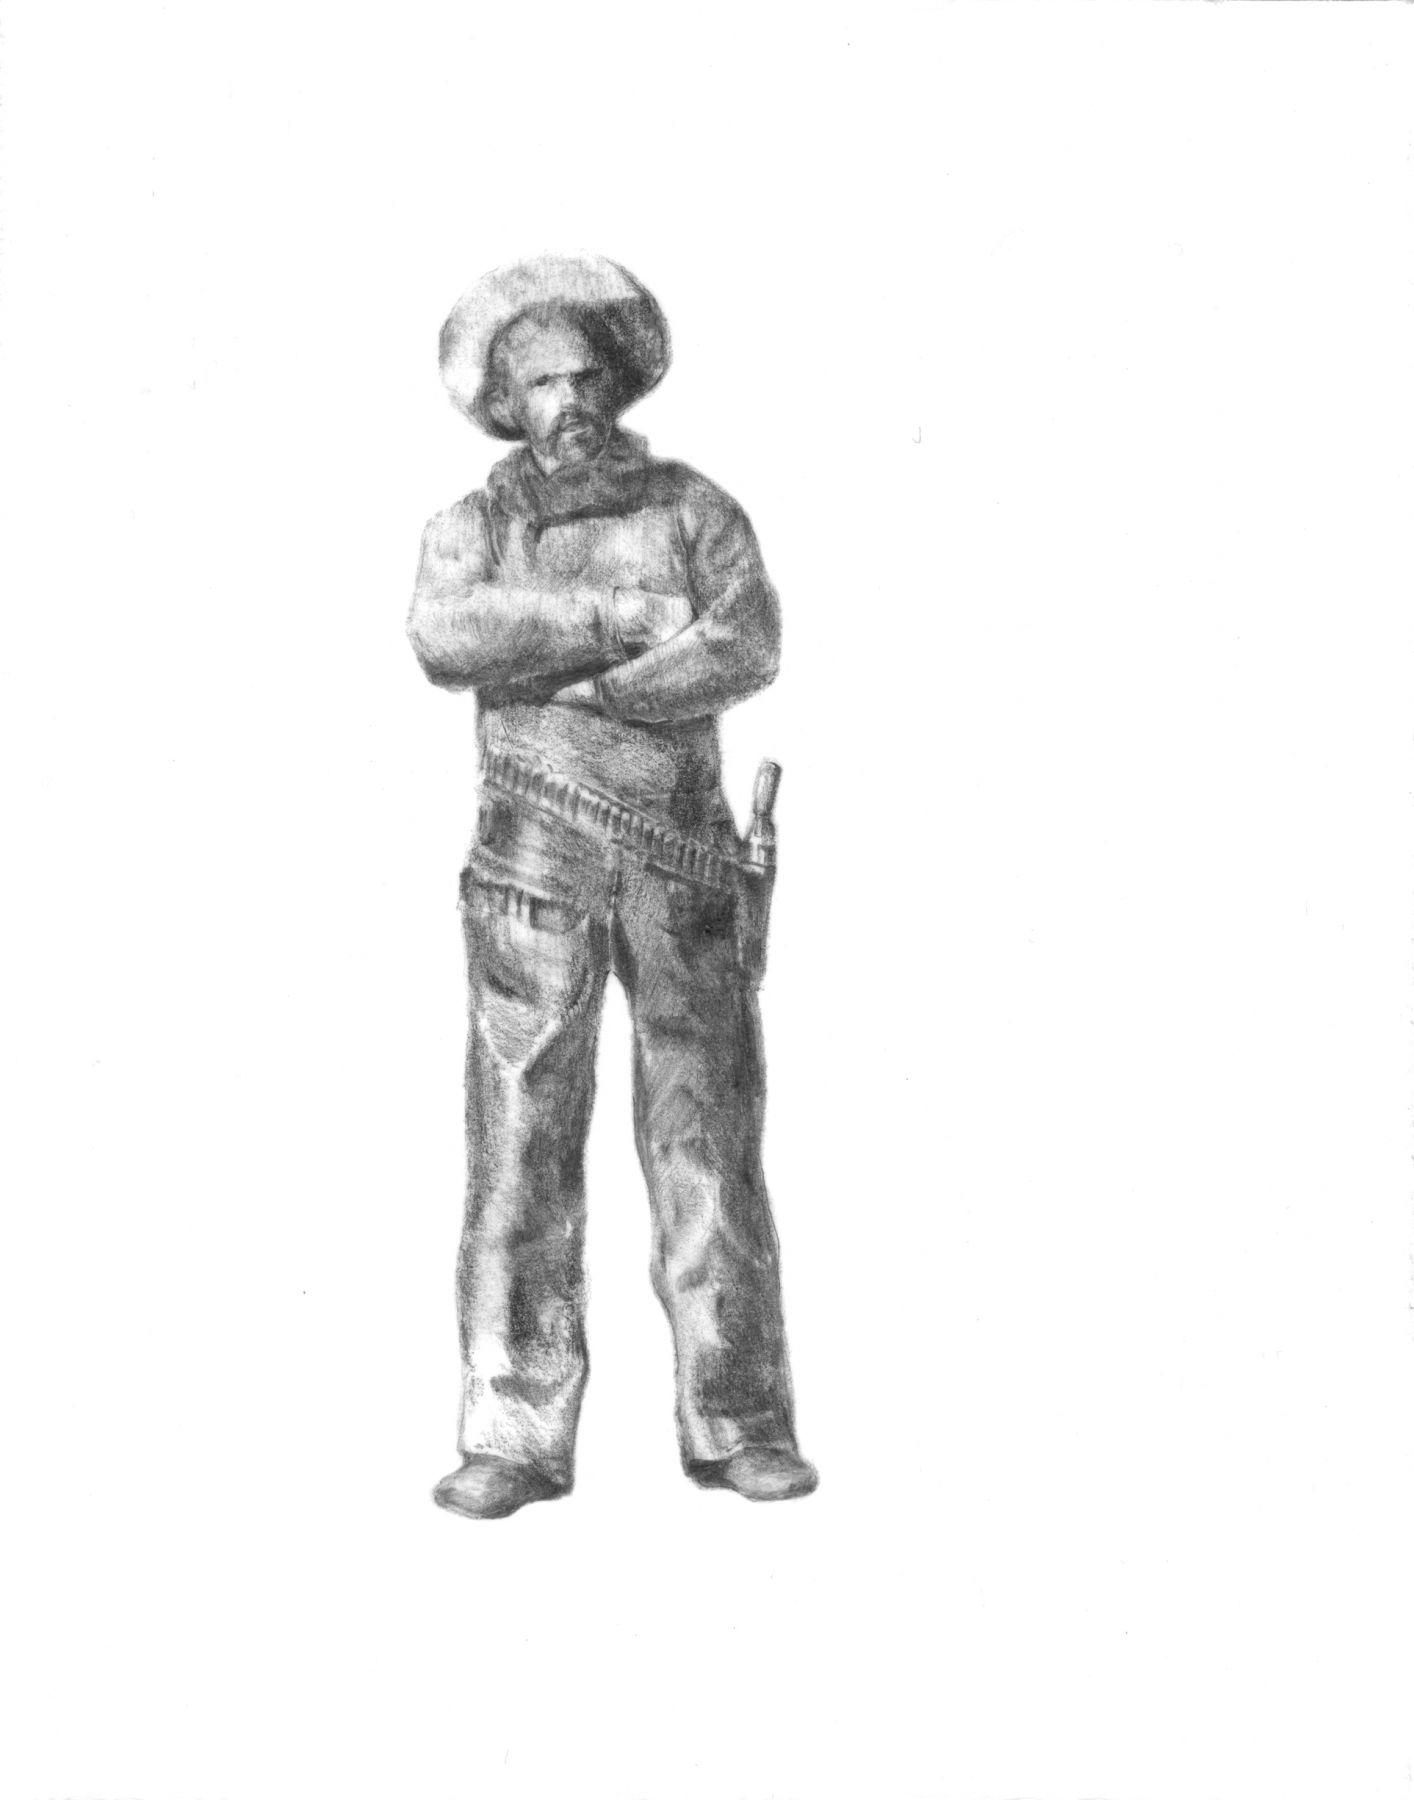 ADAM MYSOCK Cowboys Making Vowel Sounds - Ah, 2009